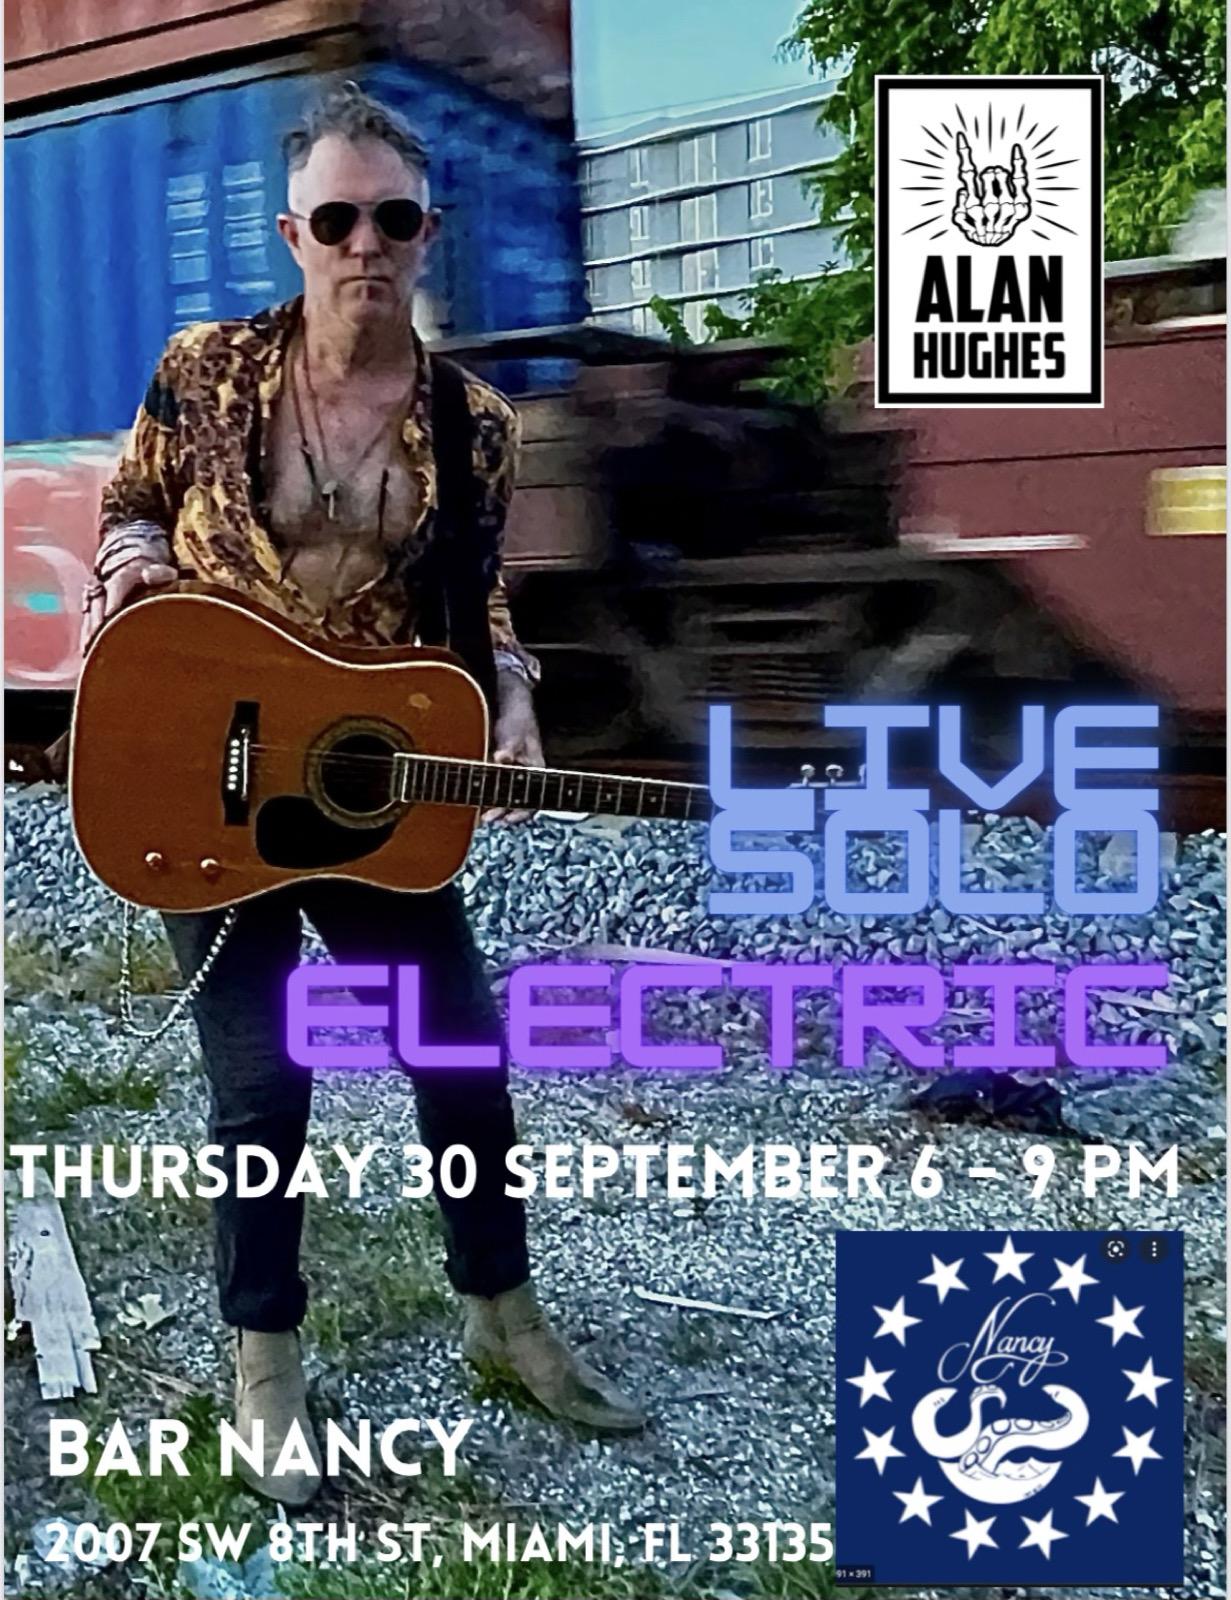 Alan Hughes Happy Hour at Bar Nancy - September 30 - Time 6pm